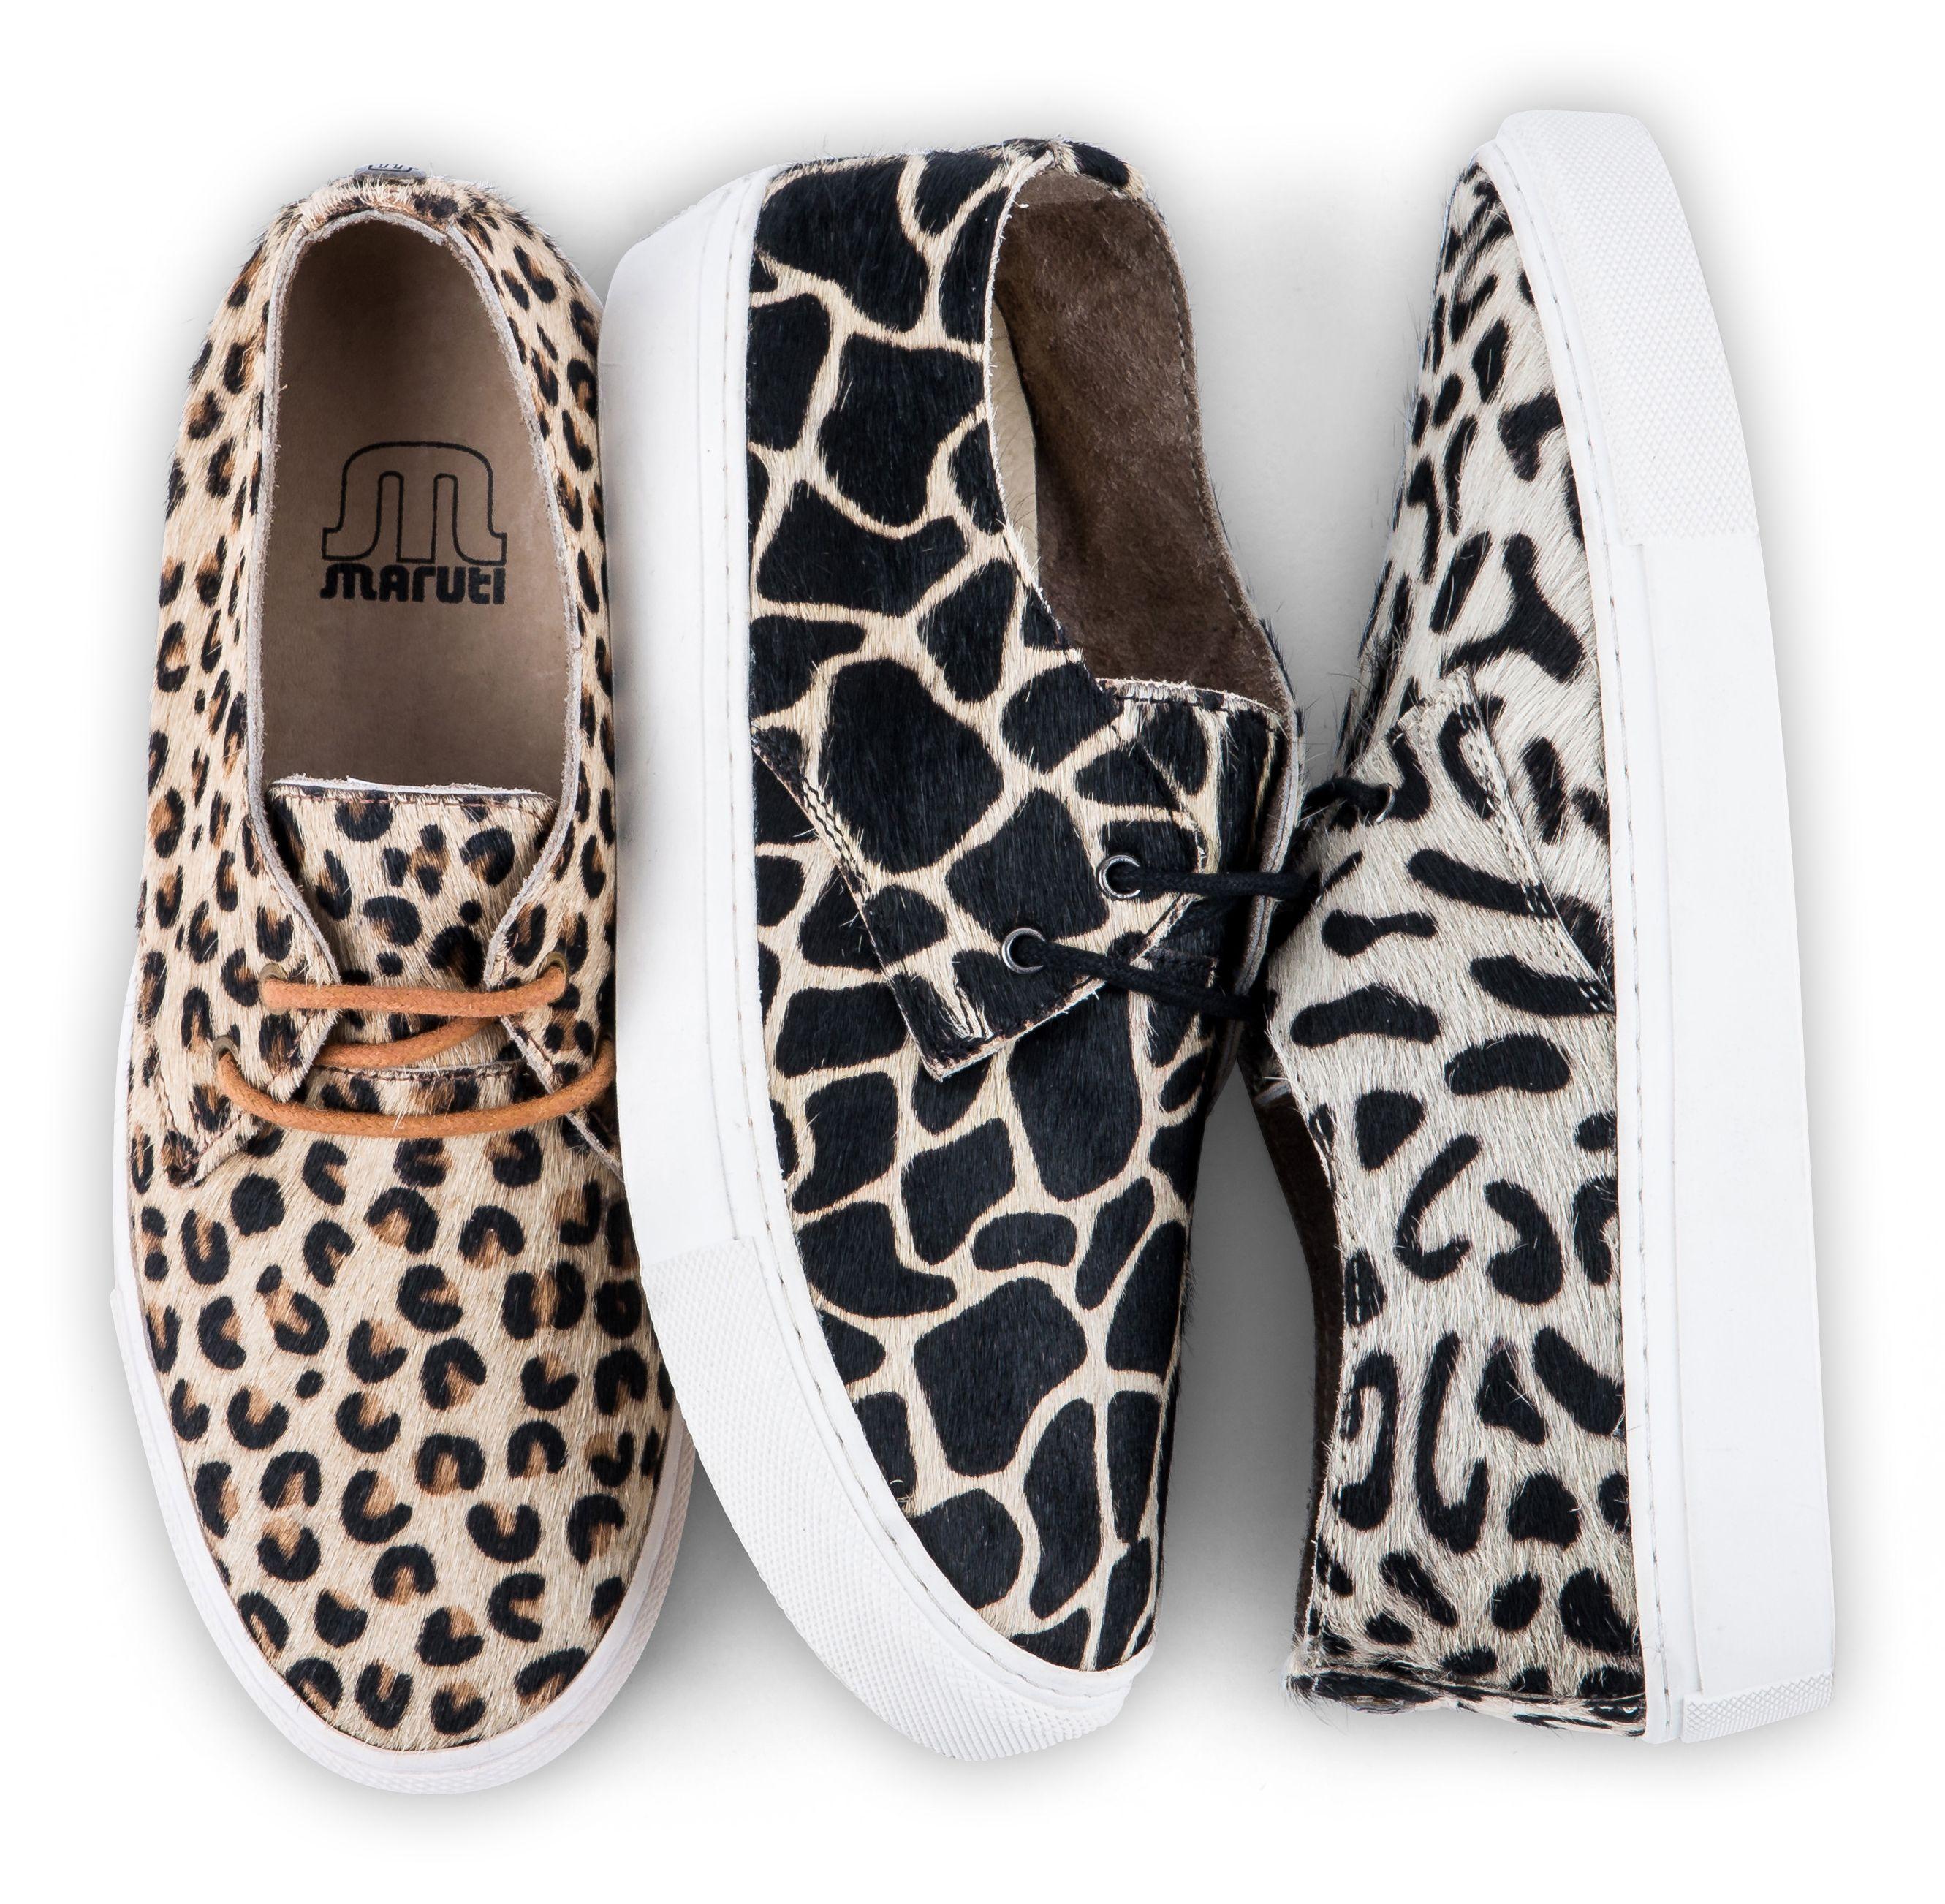 Verkrijgbaar   Intercity Boutiques! MARUTI Brazz sneakers - leopard turtle  and hyena prints for Spring Summer 2015. e764f1da5d3